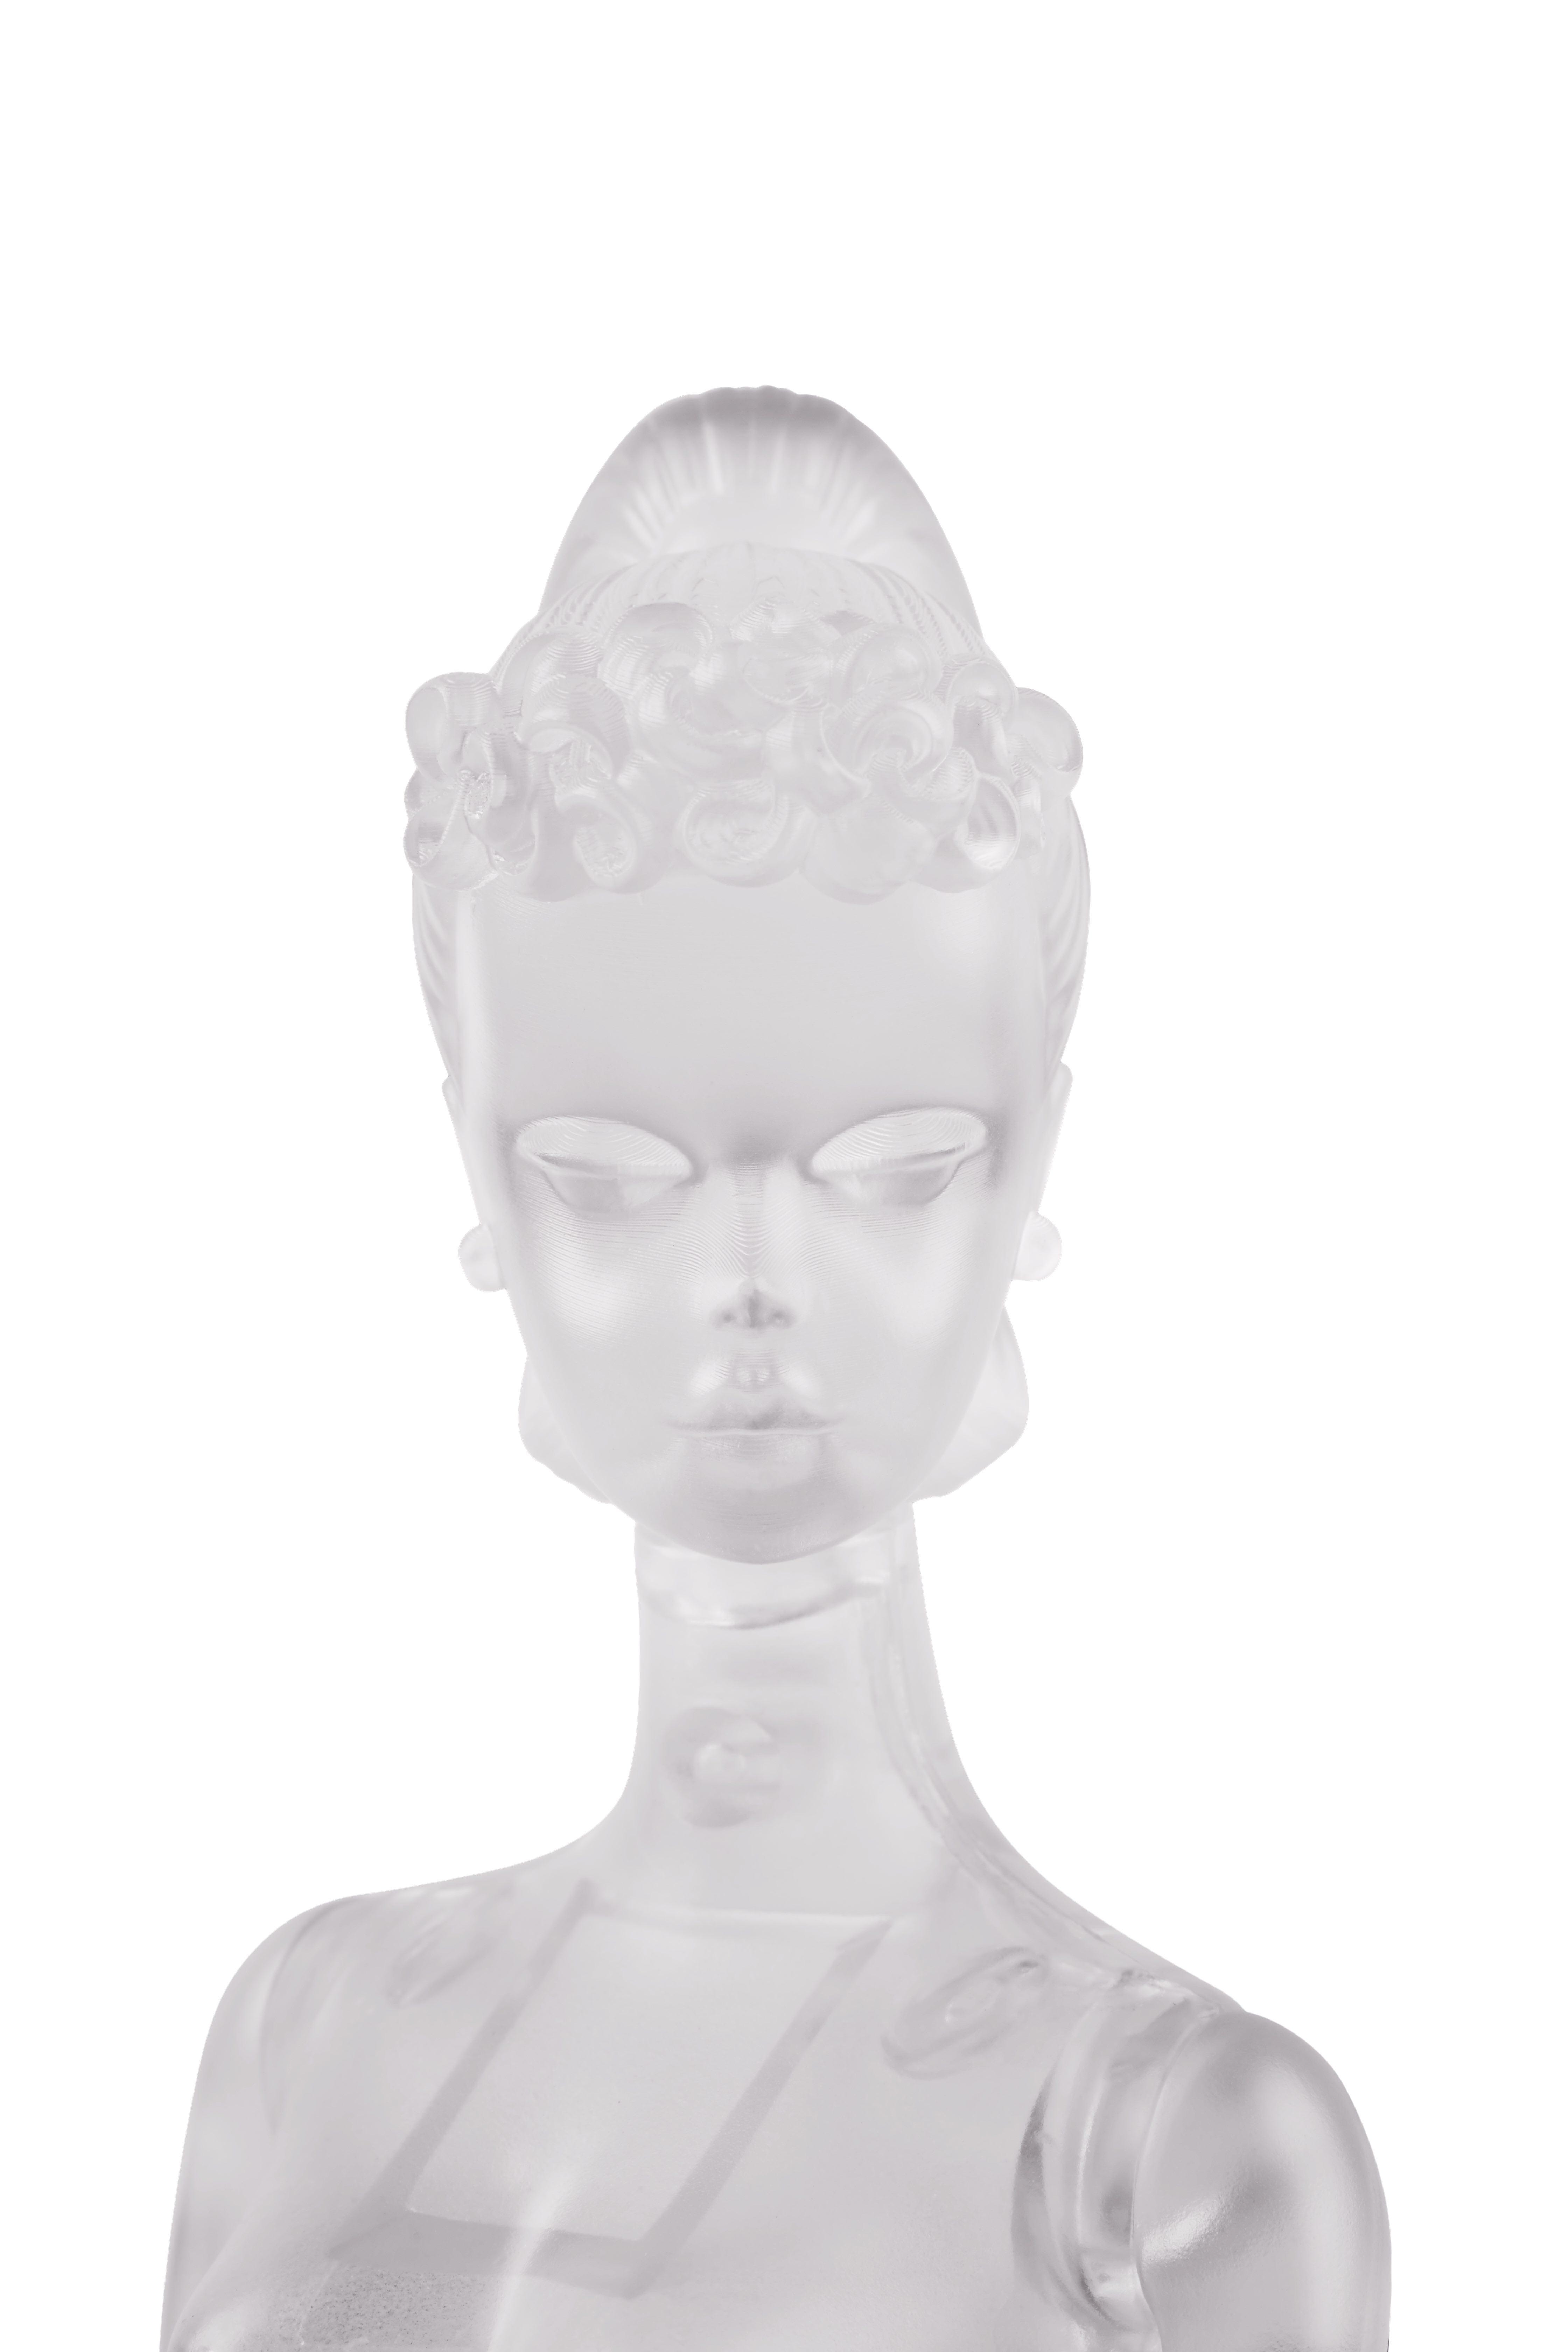 Barbie model face close up